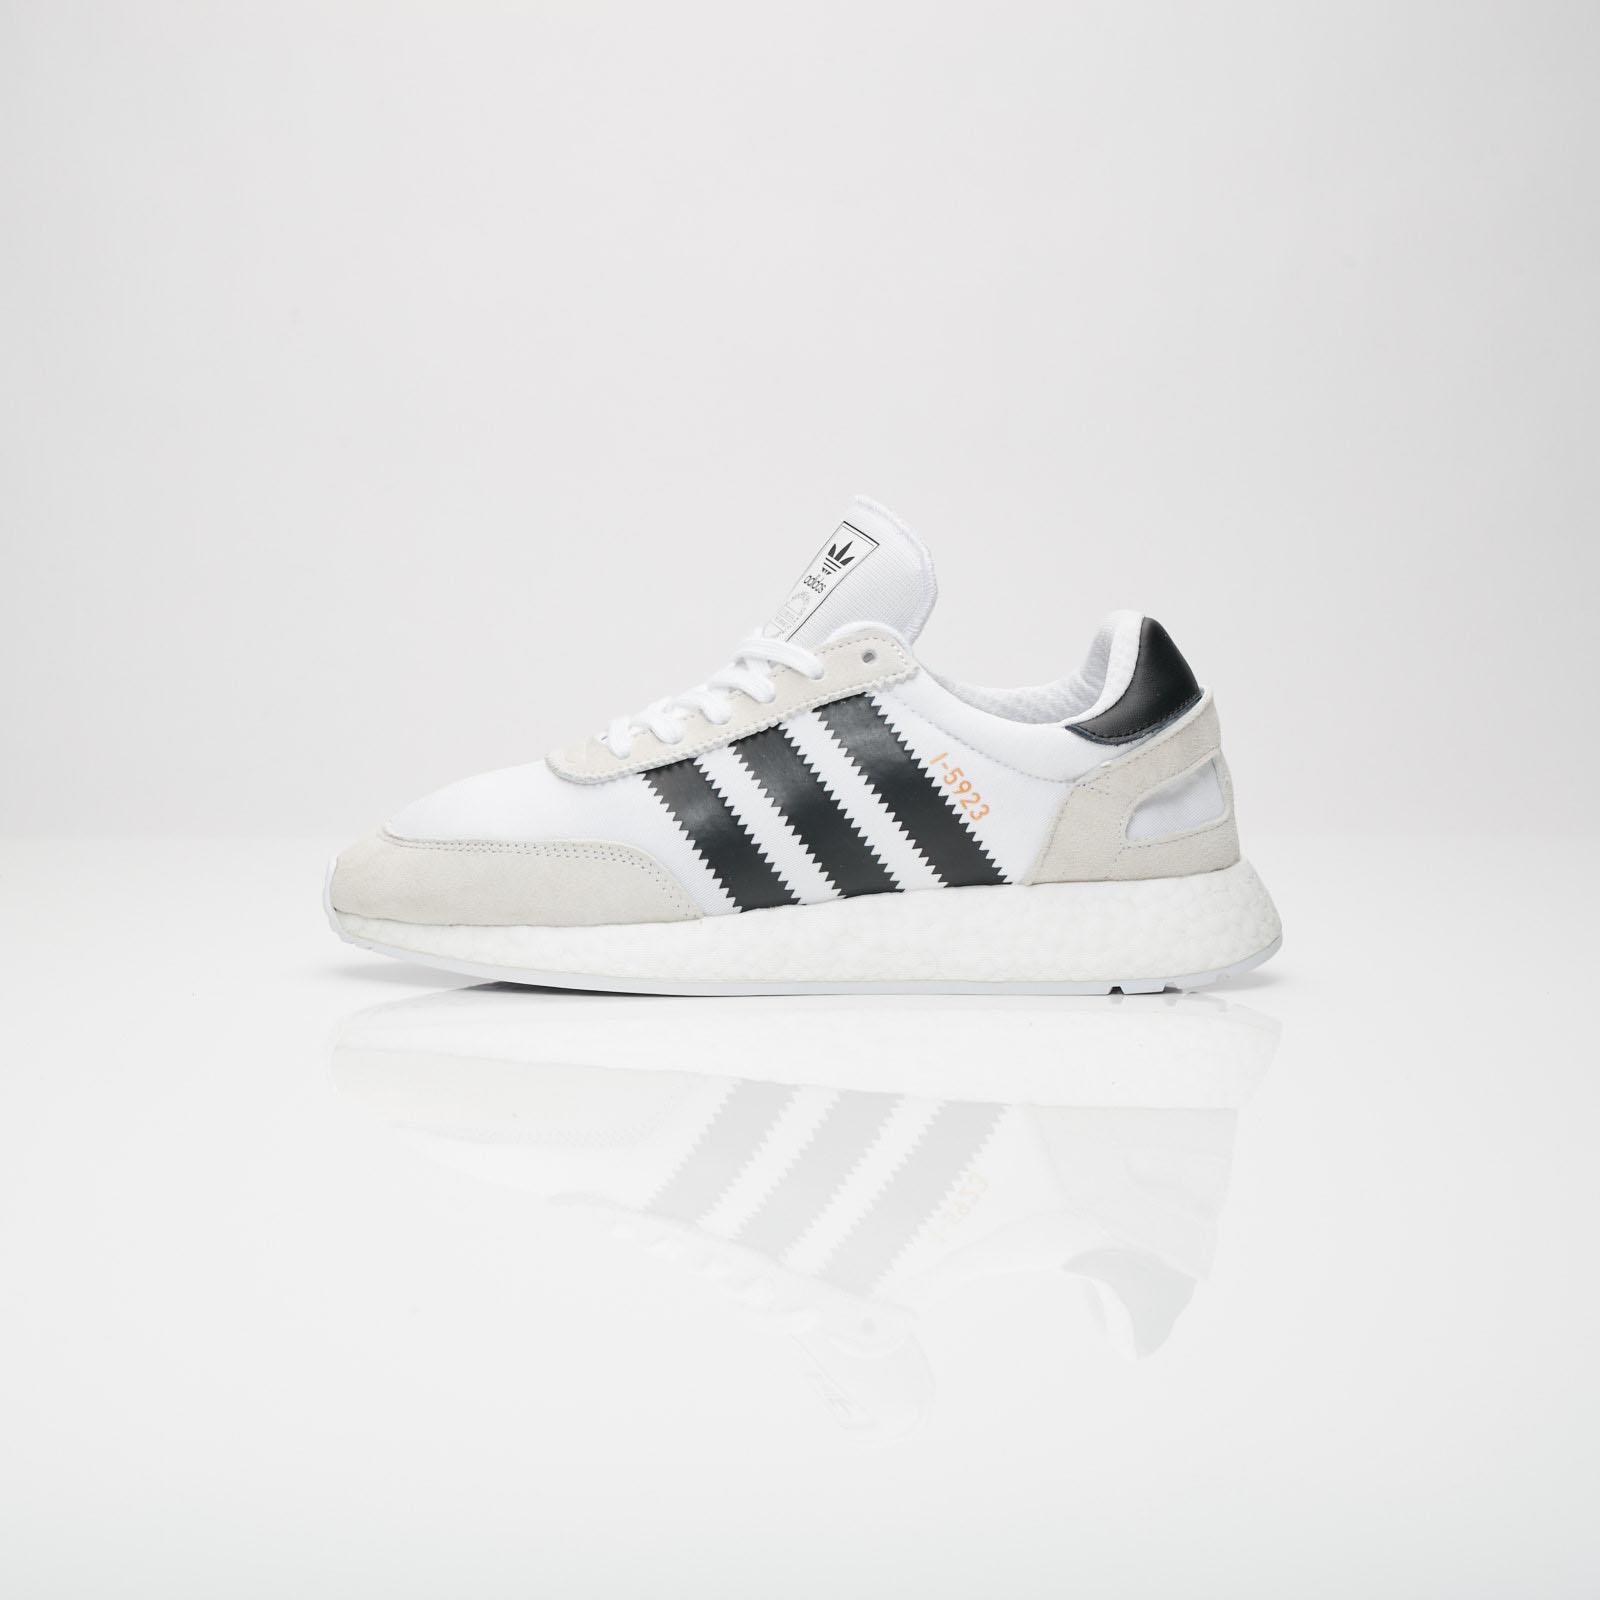 separation shoes 38e39 17df2 adidas I-5923 - Cq2489 - Sneakersnstuff   sneakers   streetwear online  since 1999